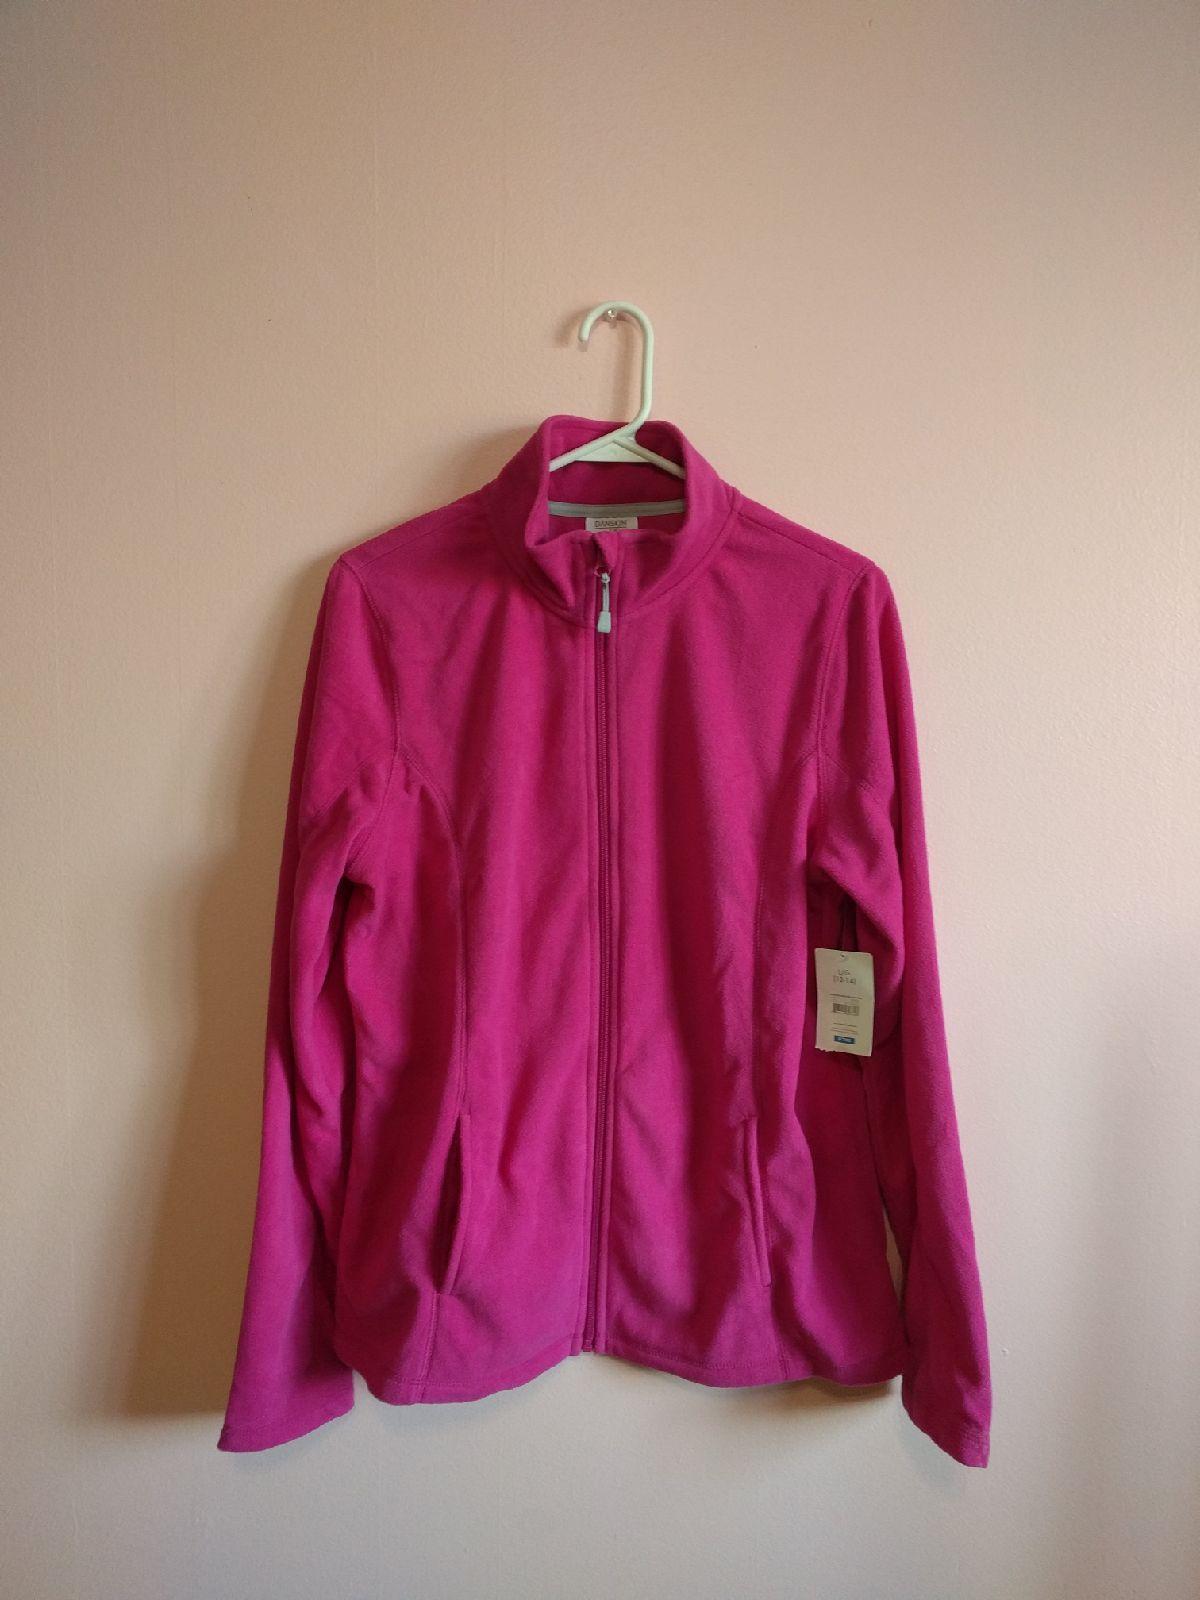 New Danskin Now Fuschia Pink Jacket - Mercari: The Selling App